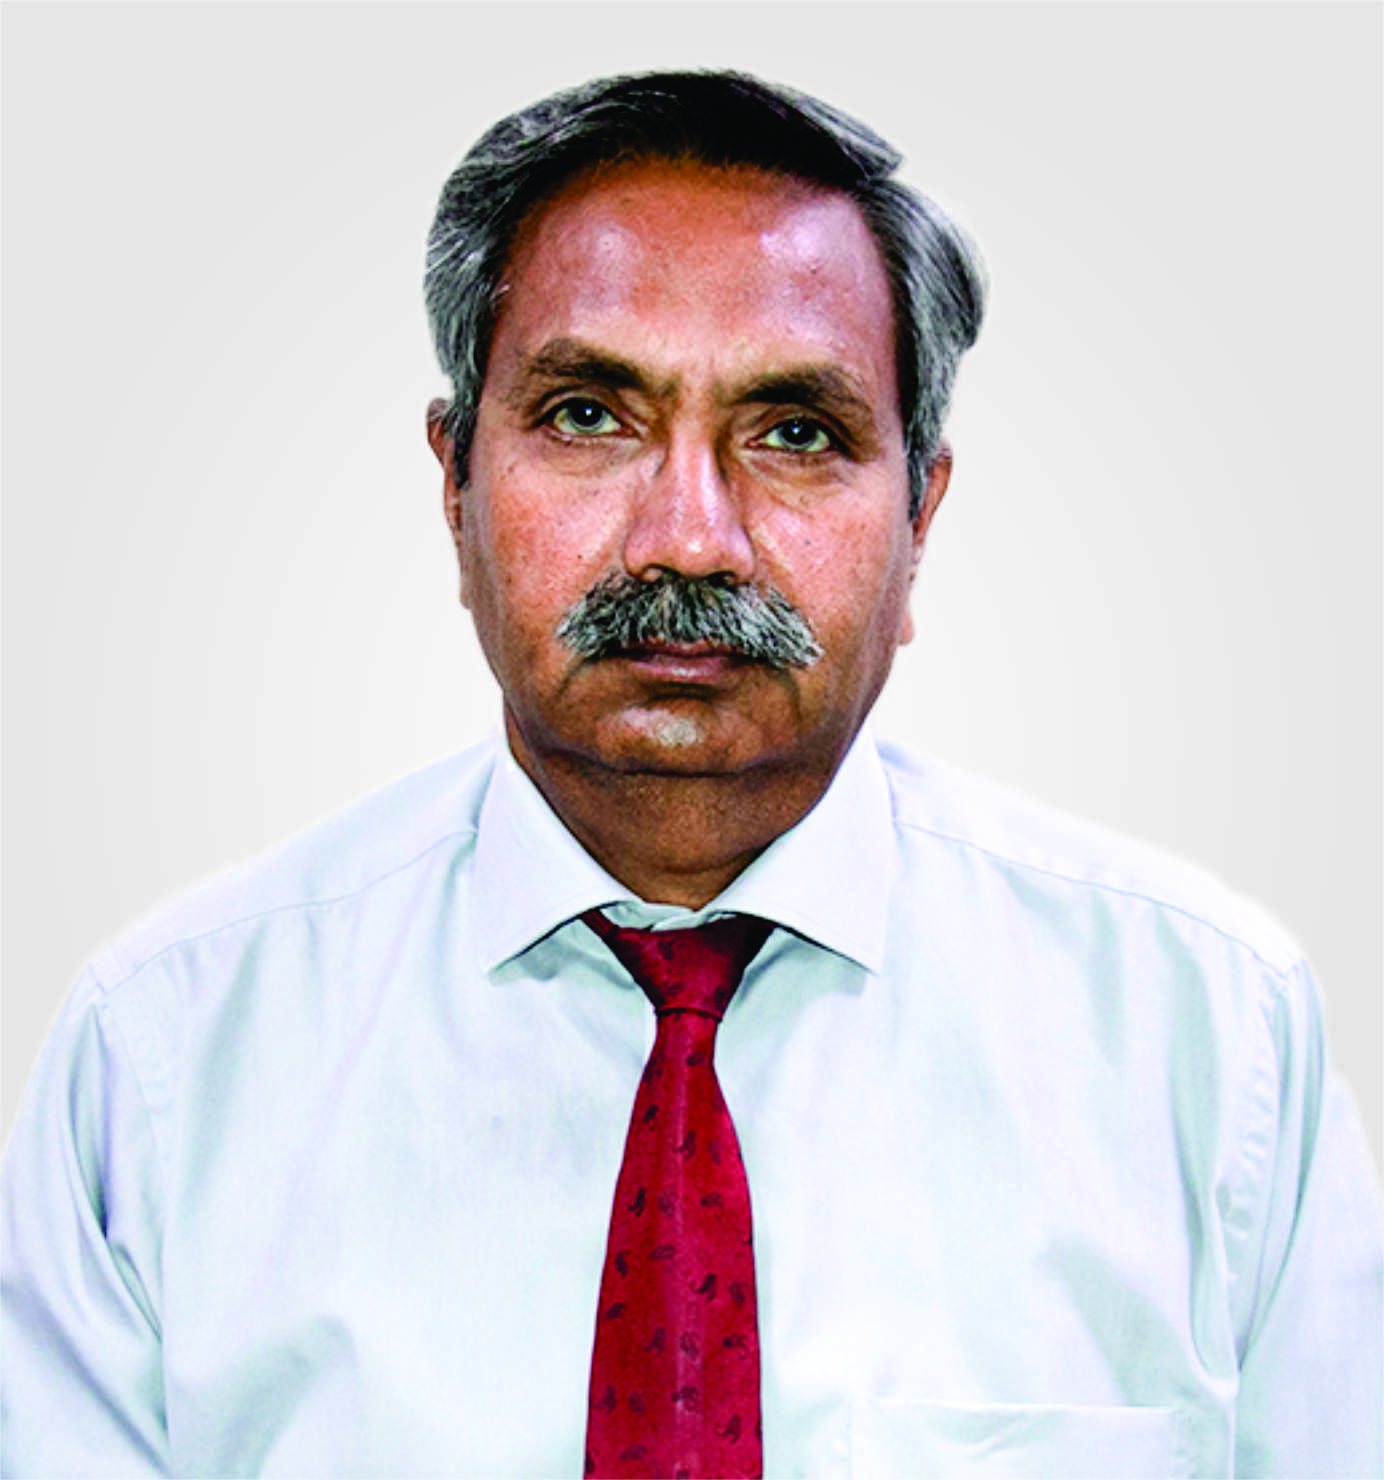 M. Nazir Awan